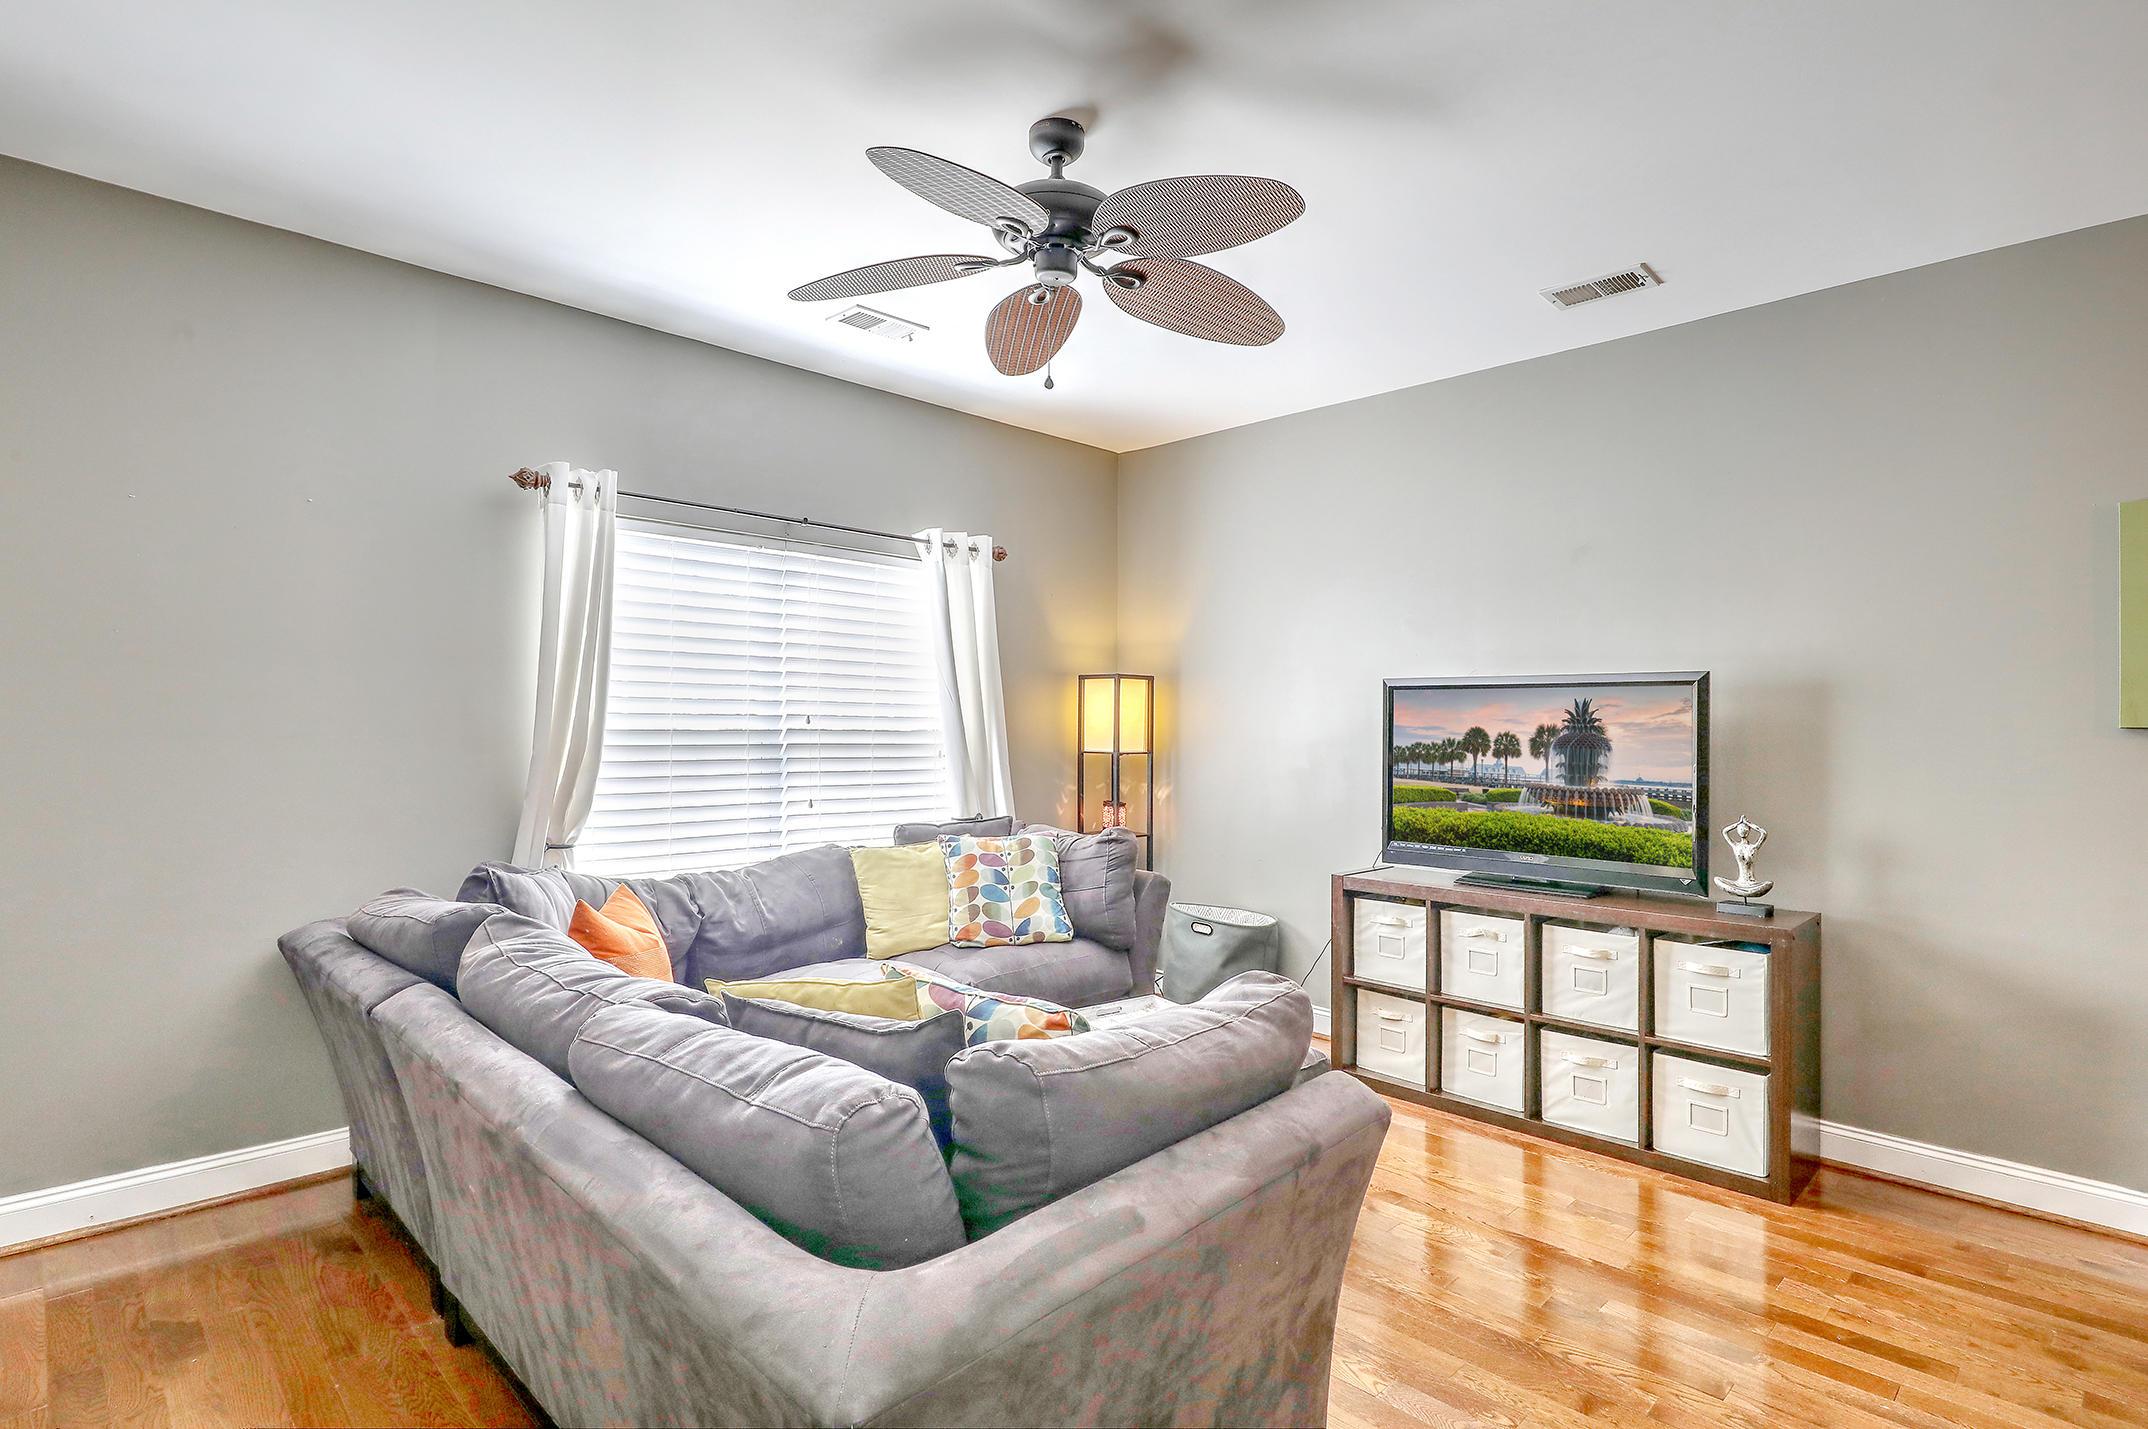 Ashley Park Homes For Sale - 4025 Hartland, Charleston, SC - 14